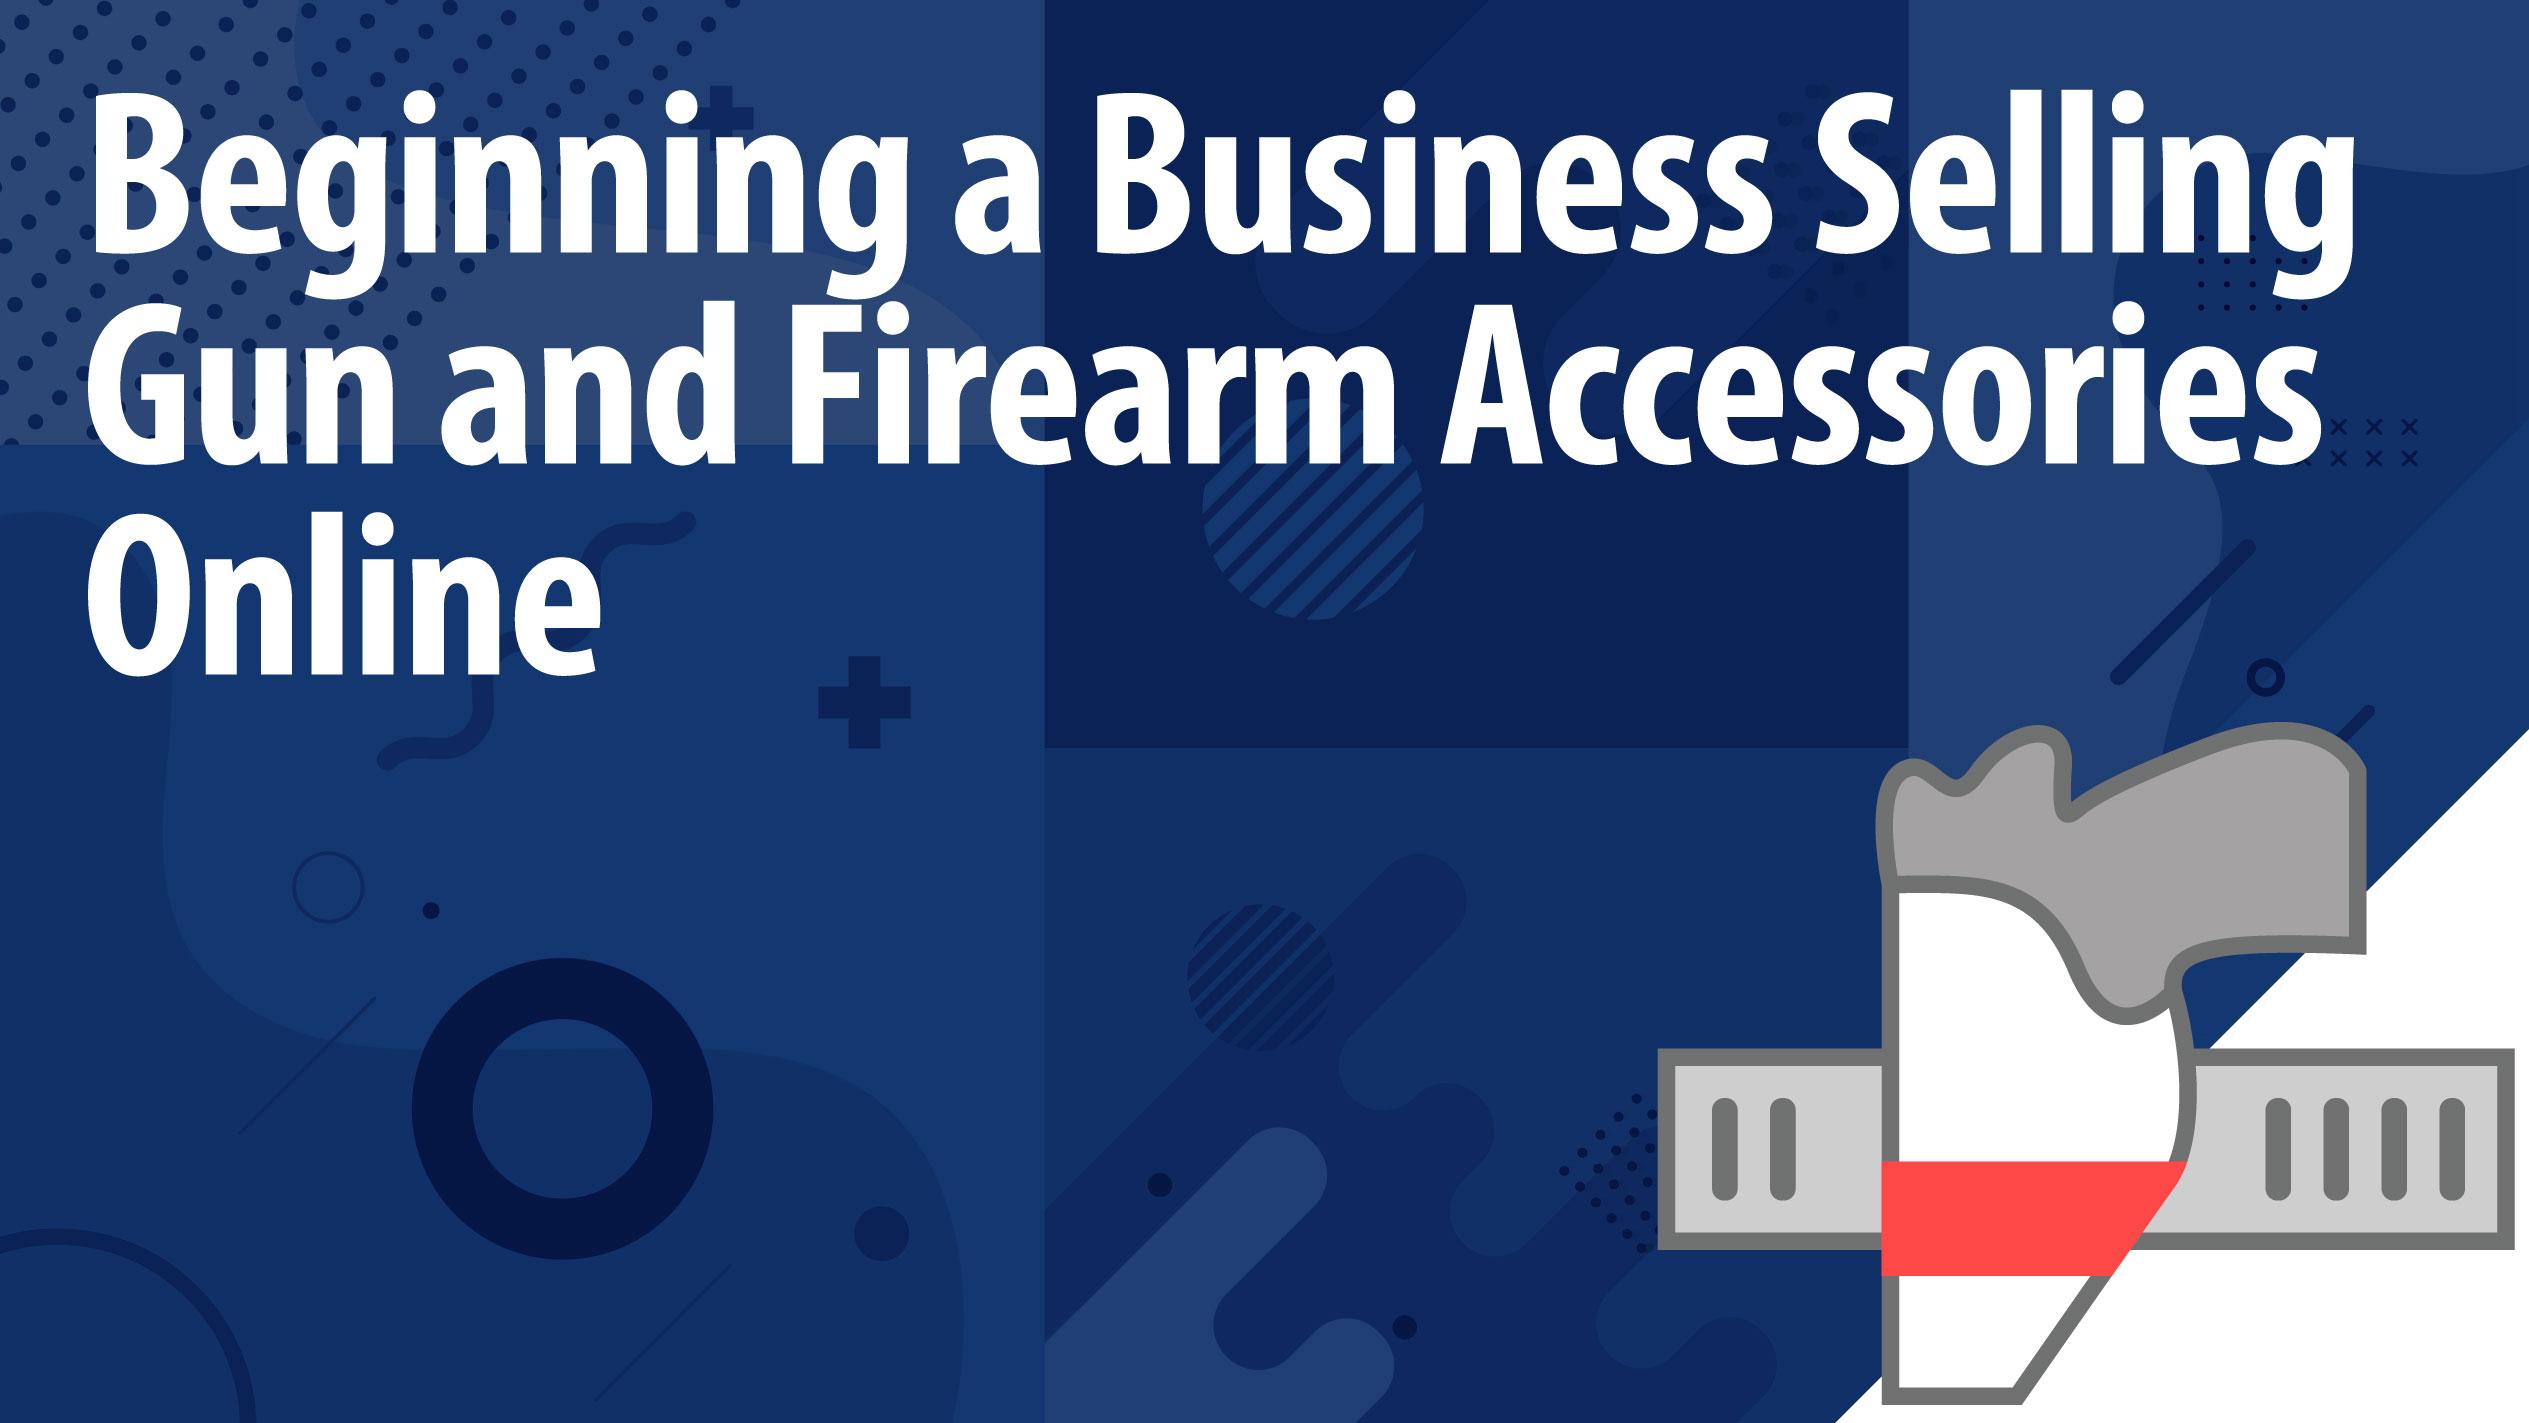 Beginning a Business Selling Gun and Firearm Accessories Online